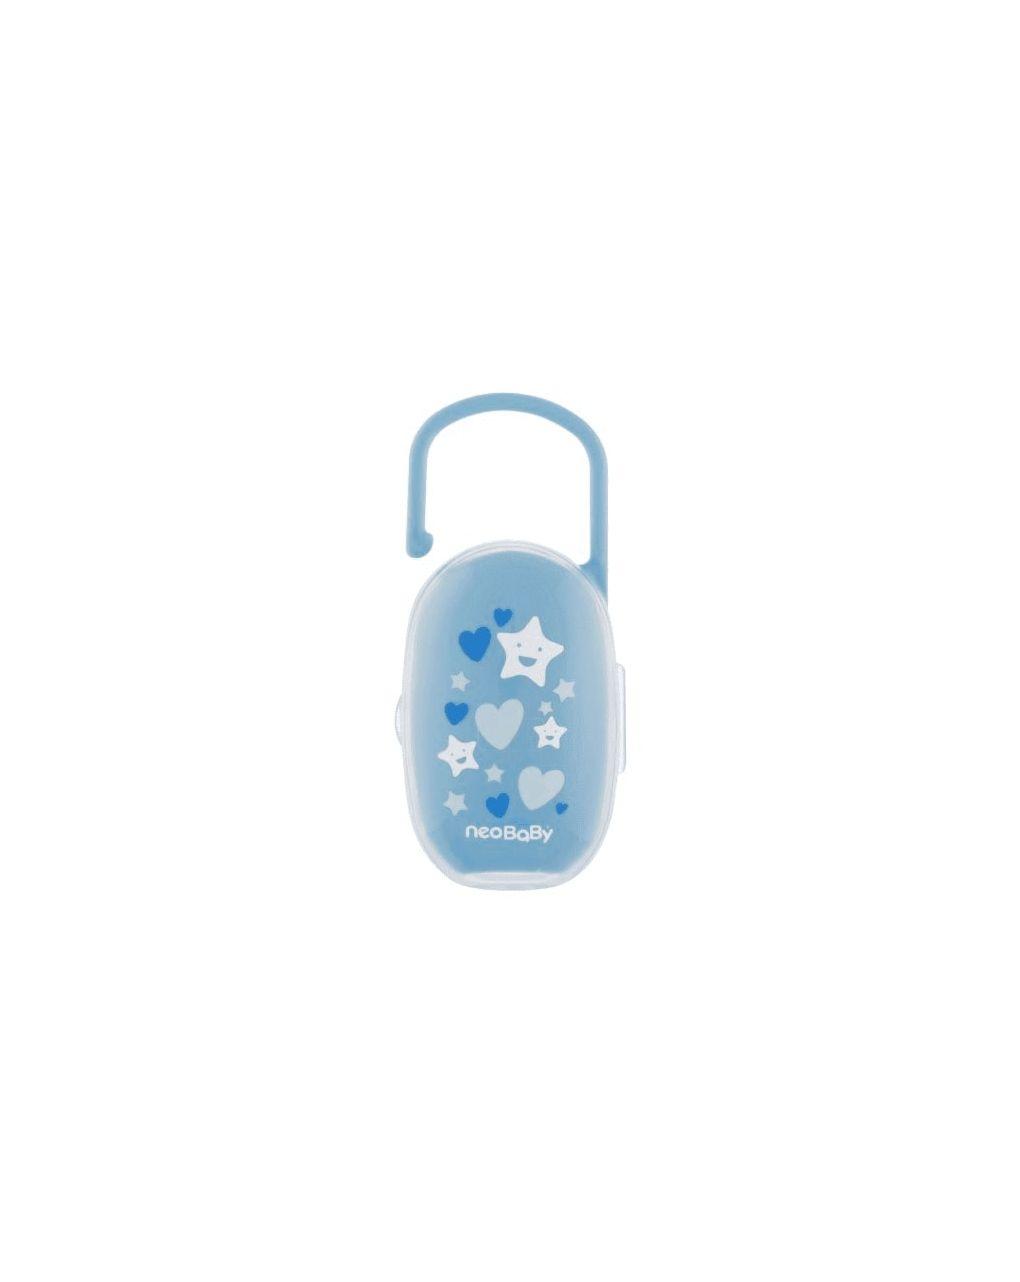 Portasucchietto azzurro neobaby - Neo Baby